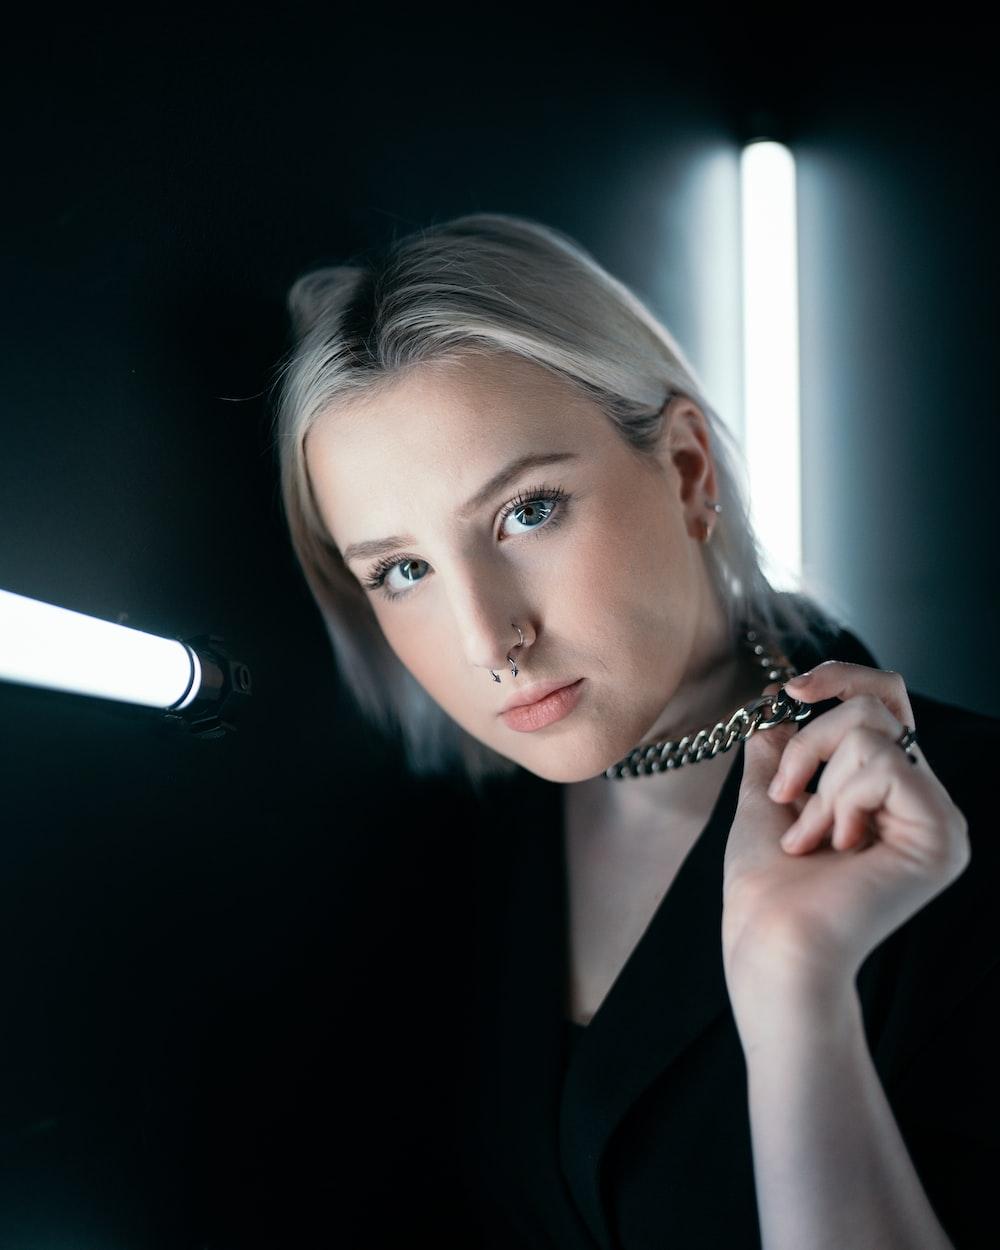 woman in black blazer holding microphone